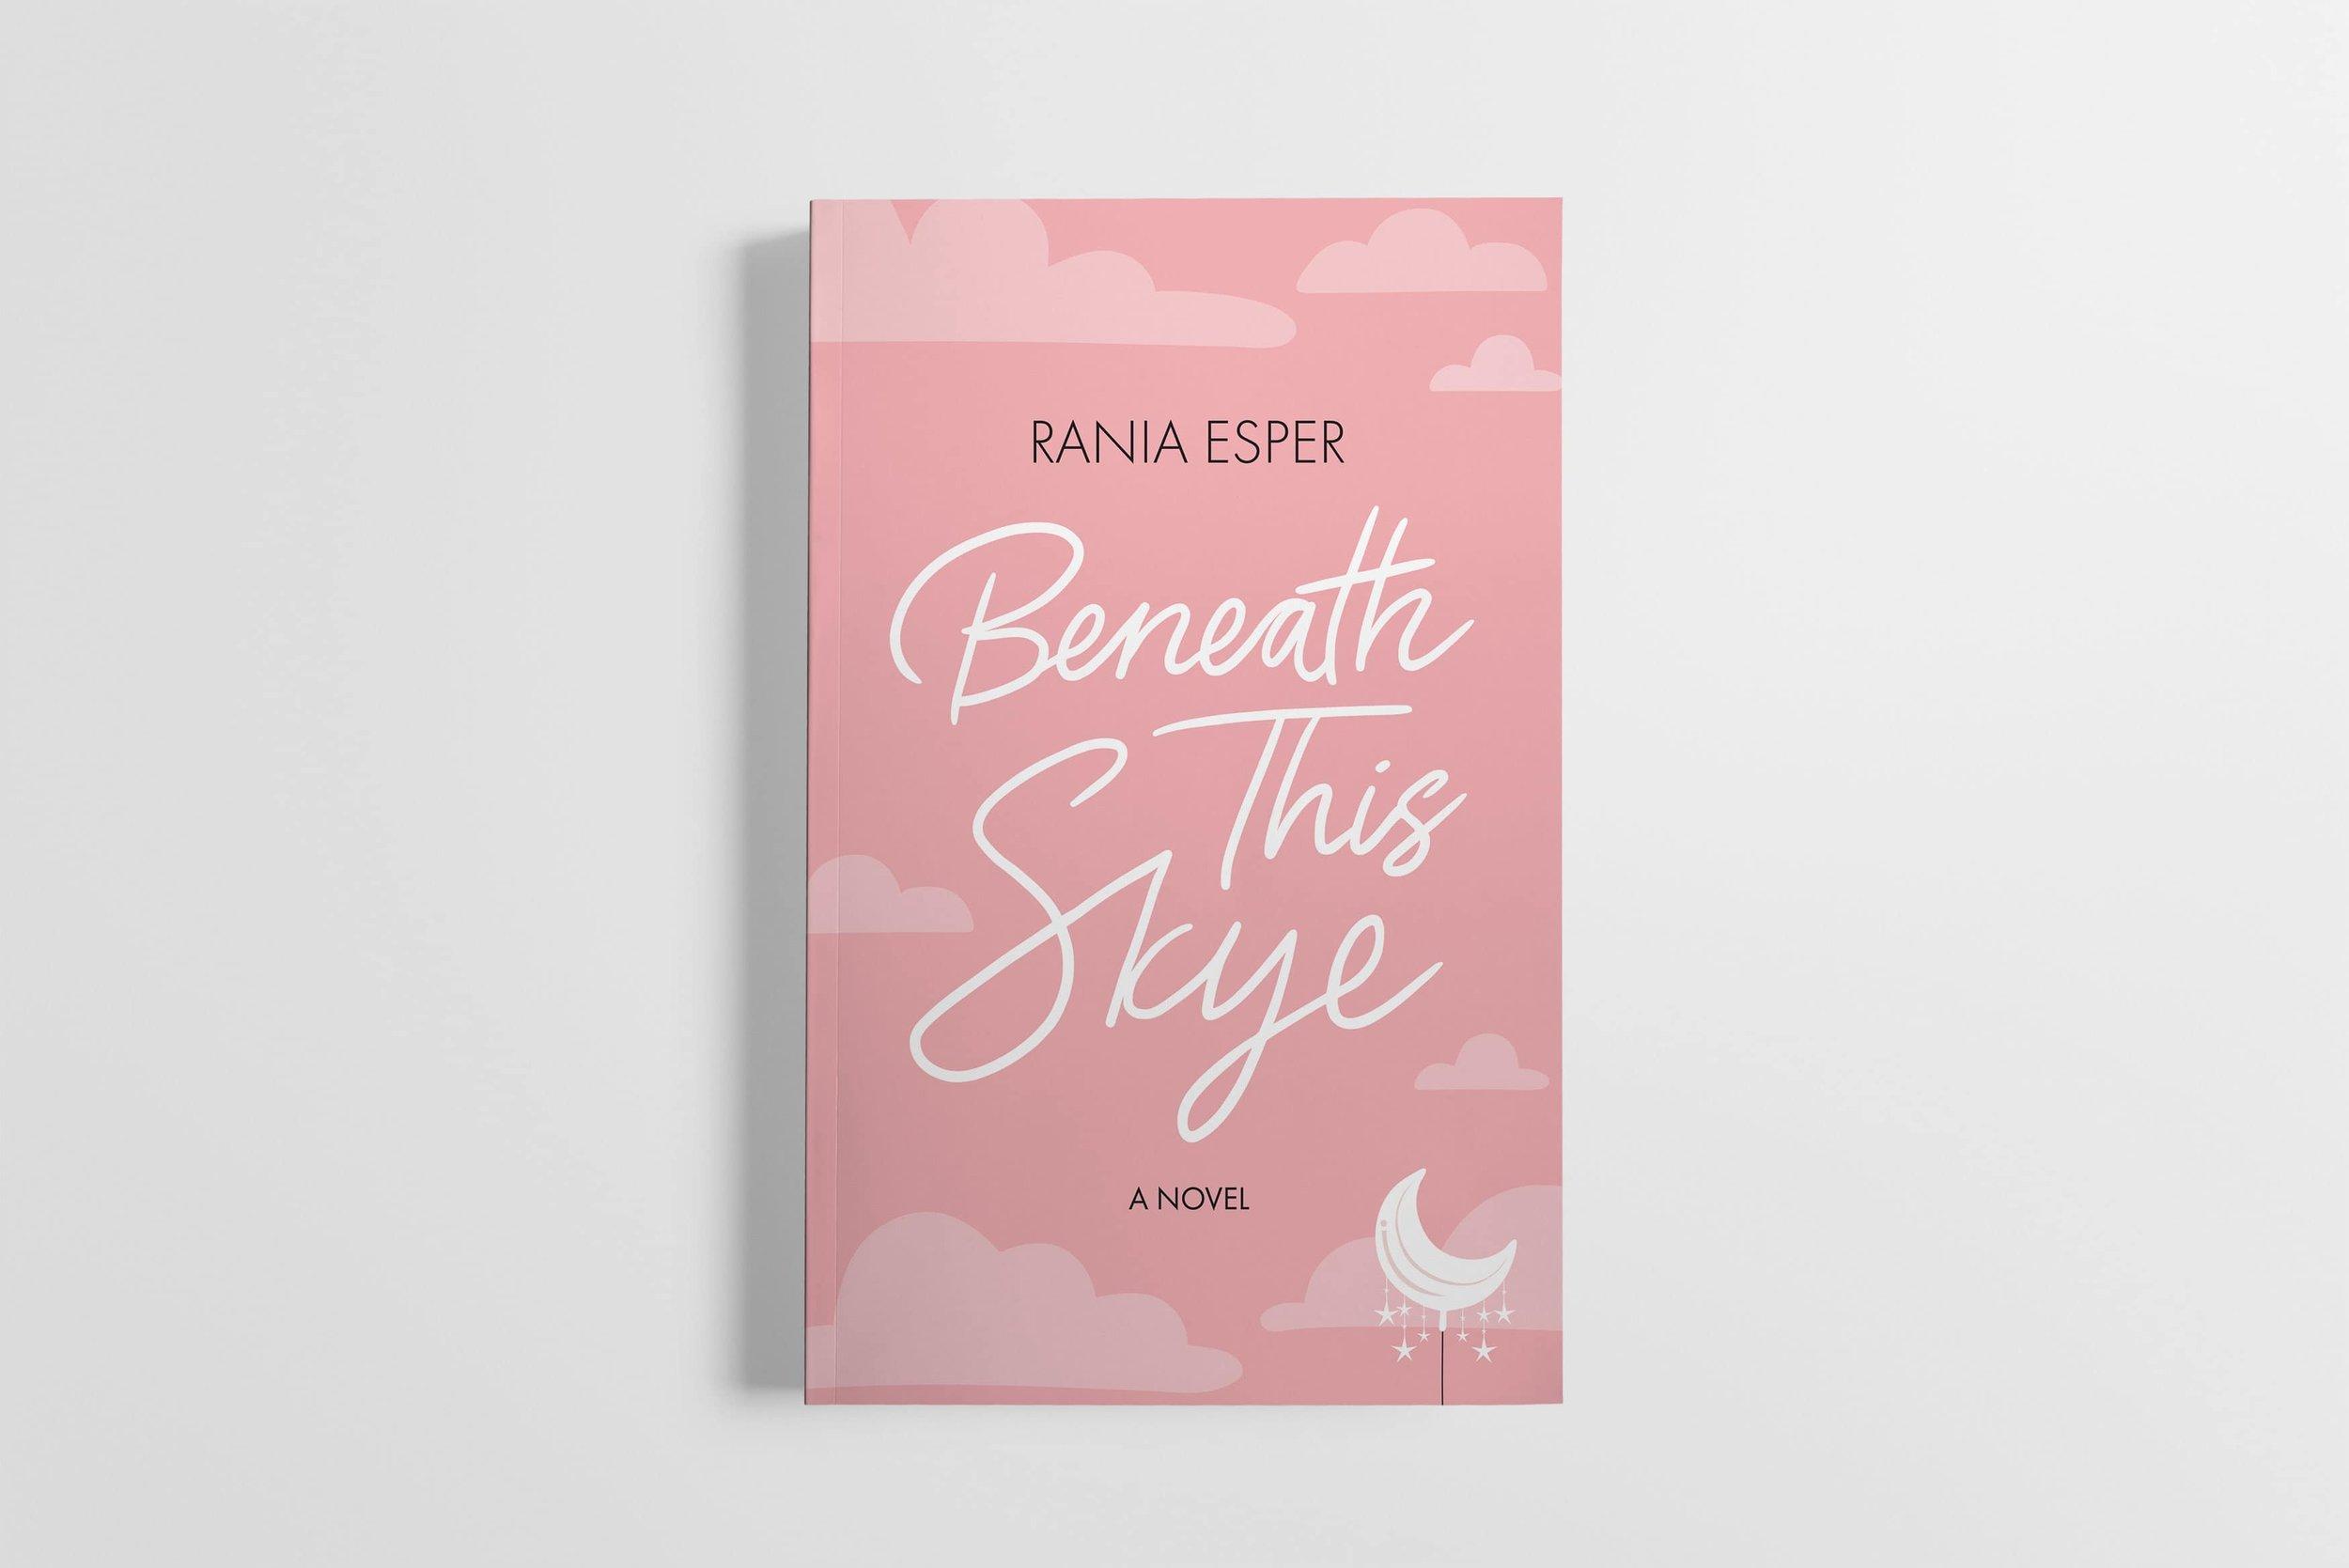 Rania-Esper-Beneath-This-Skye-Interior3.jpg